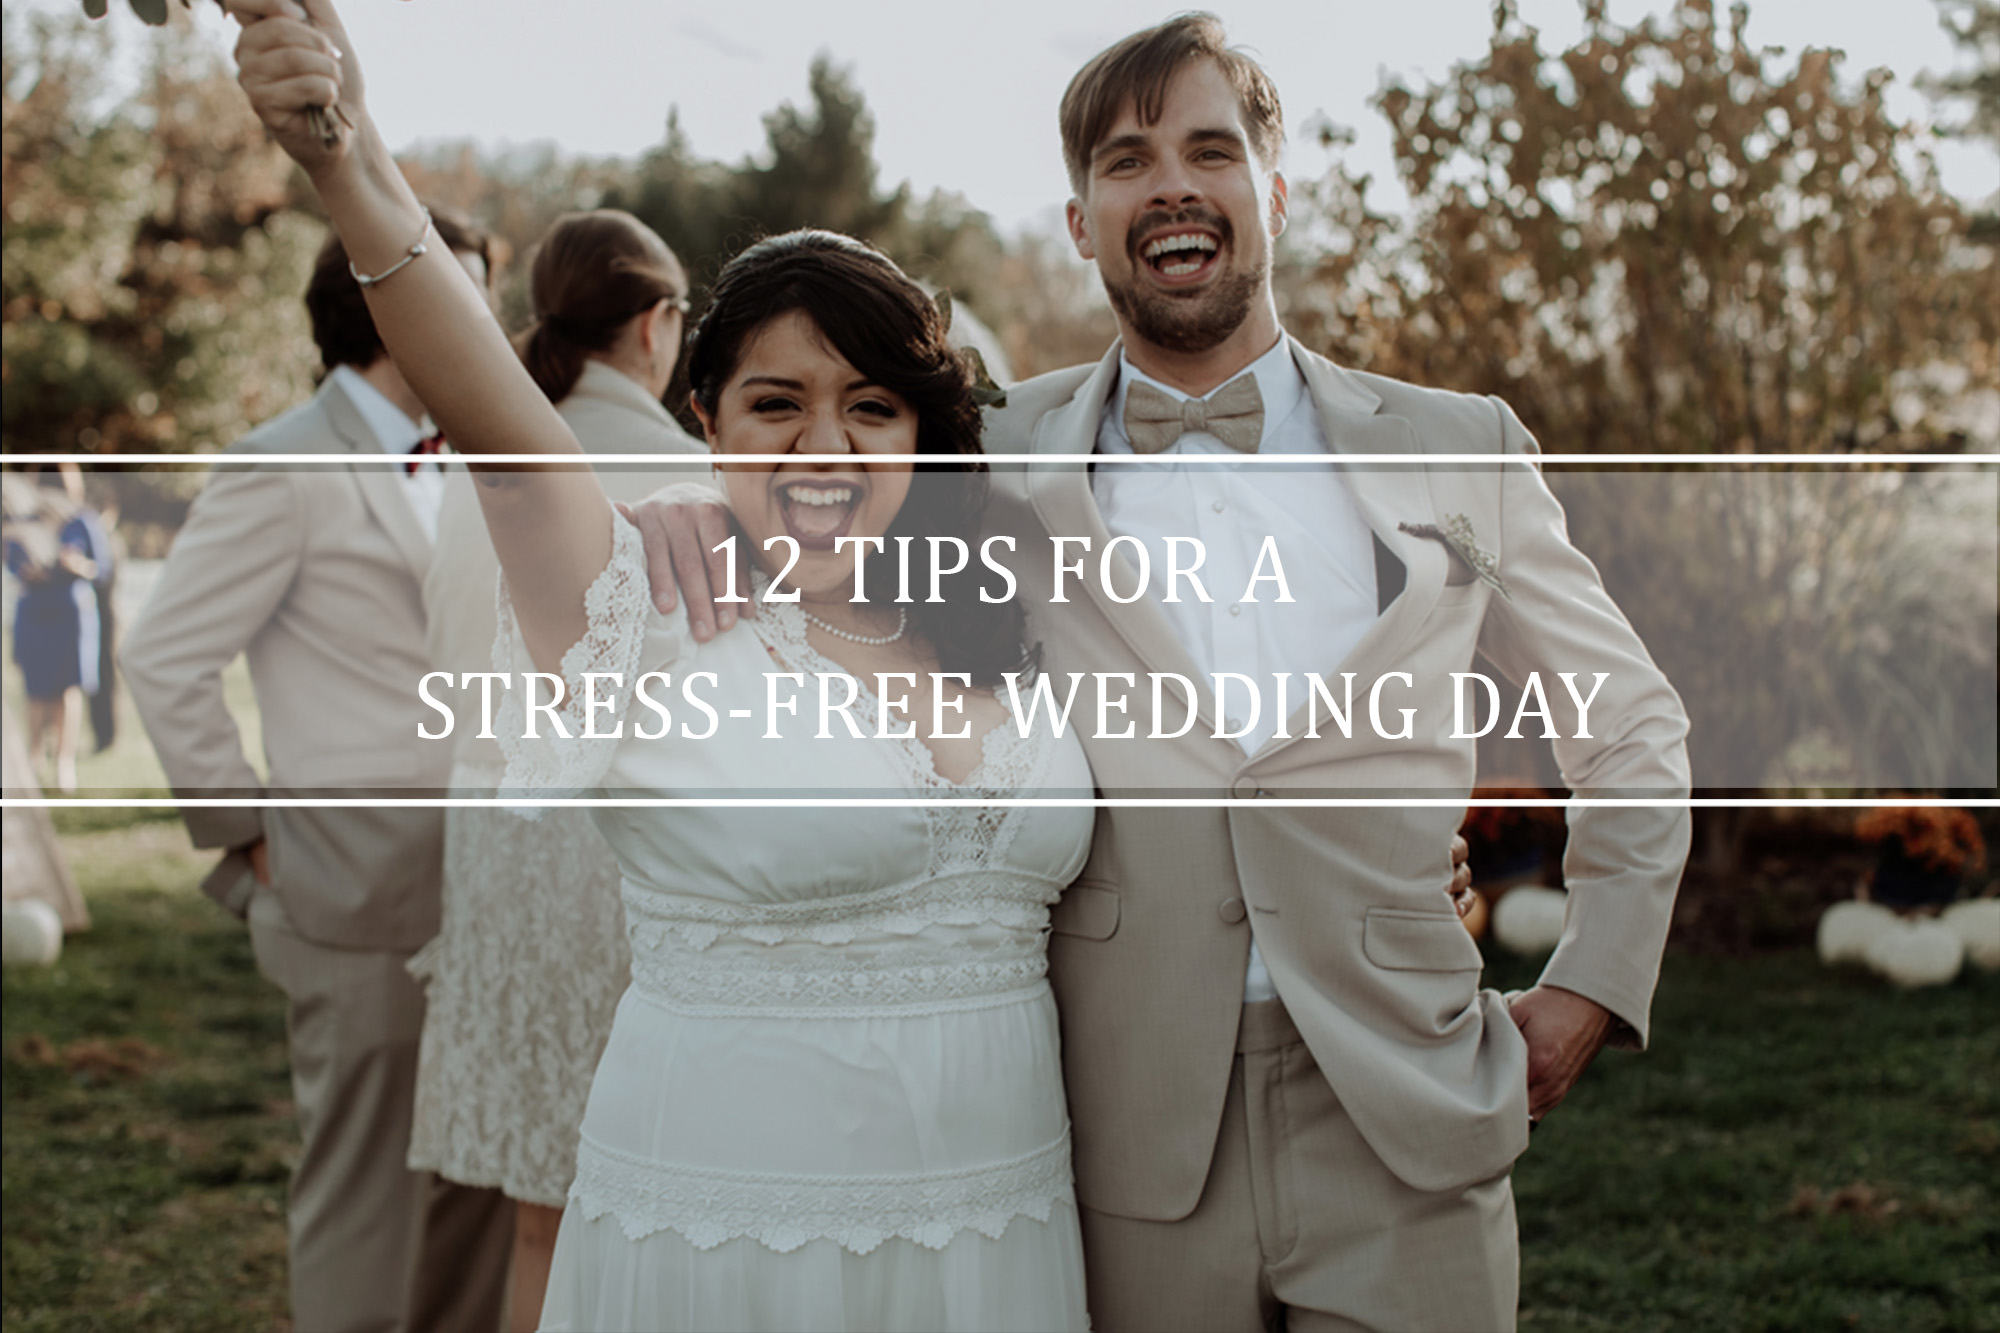 12tips-for-wedding-day-stress-free.jpg